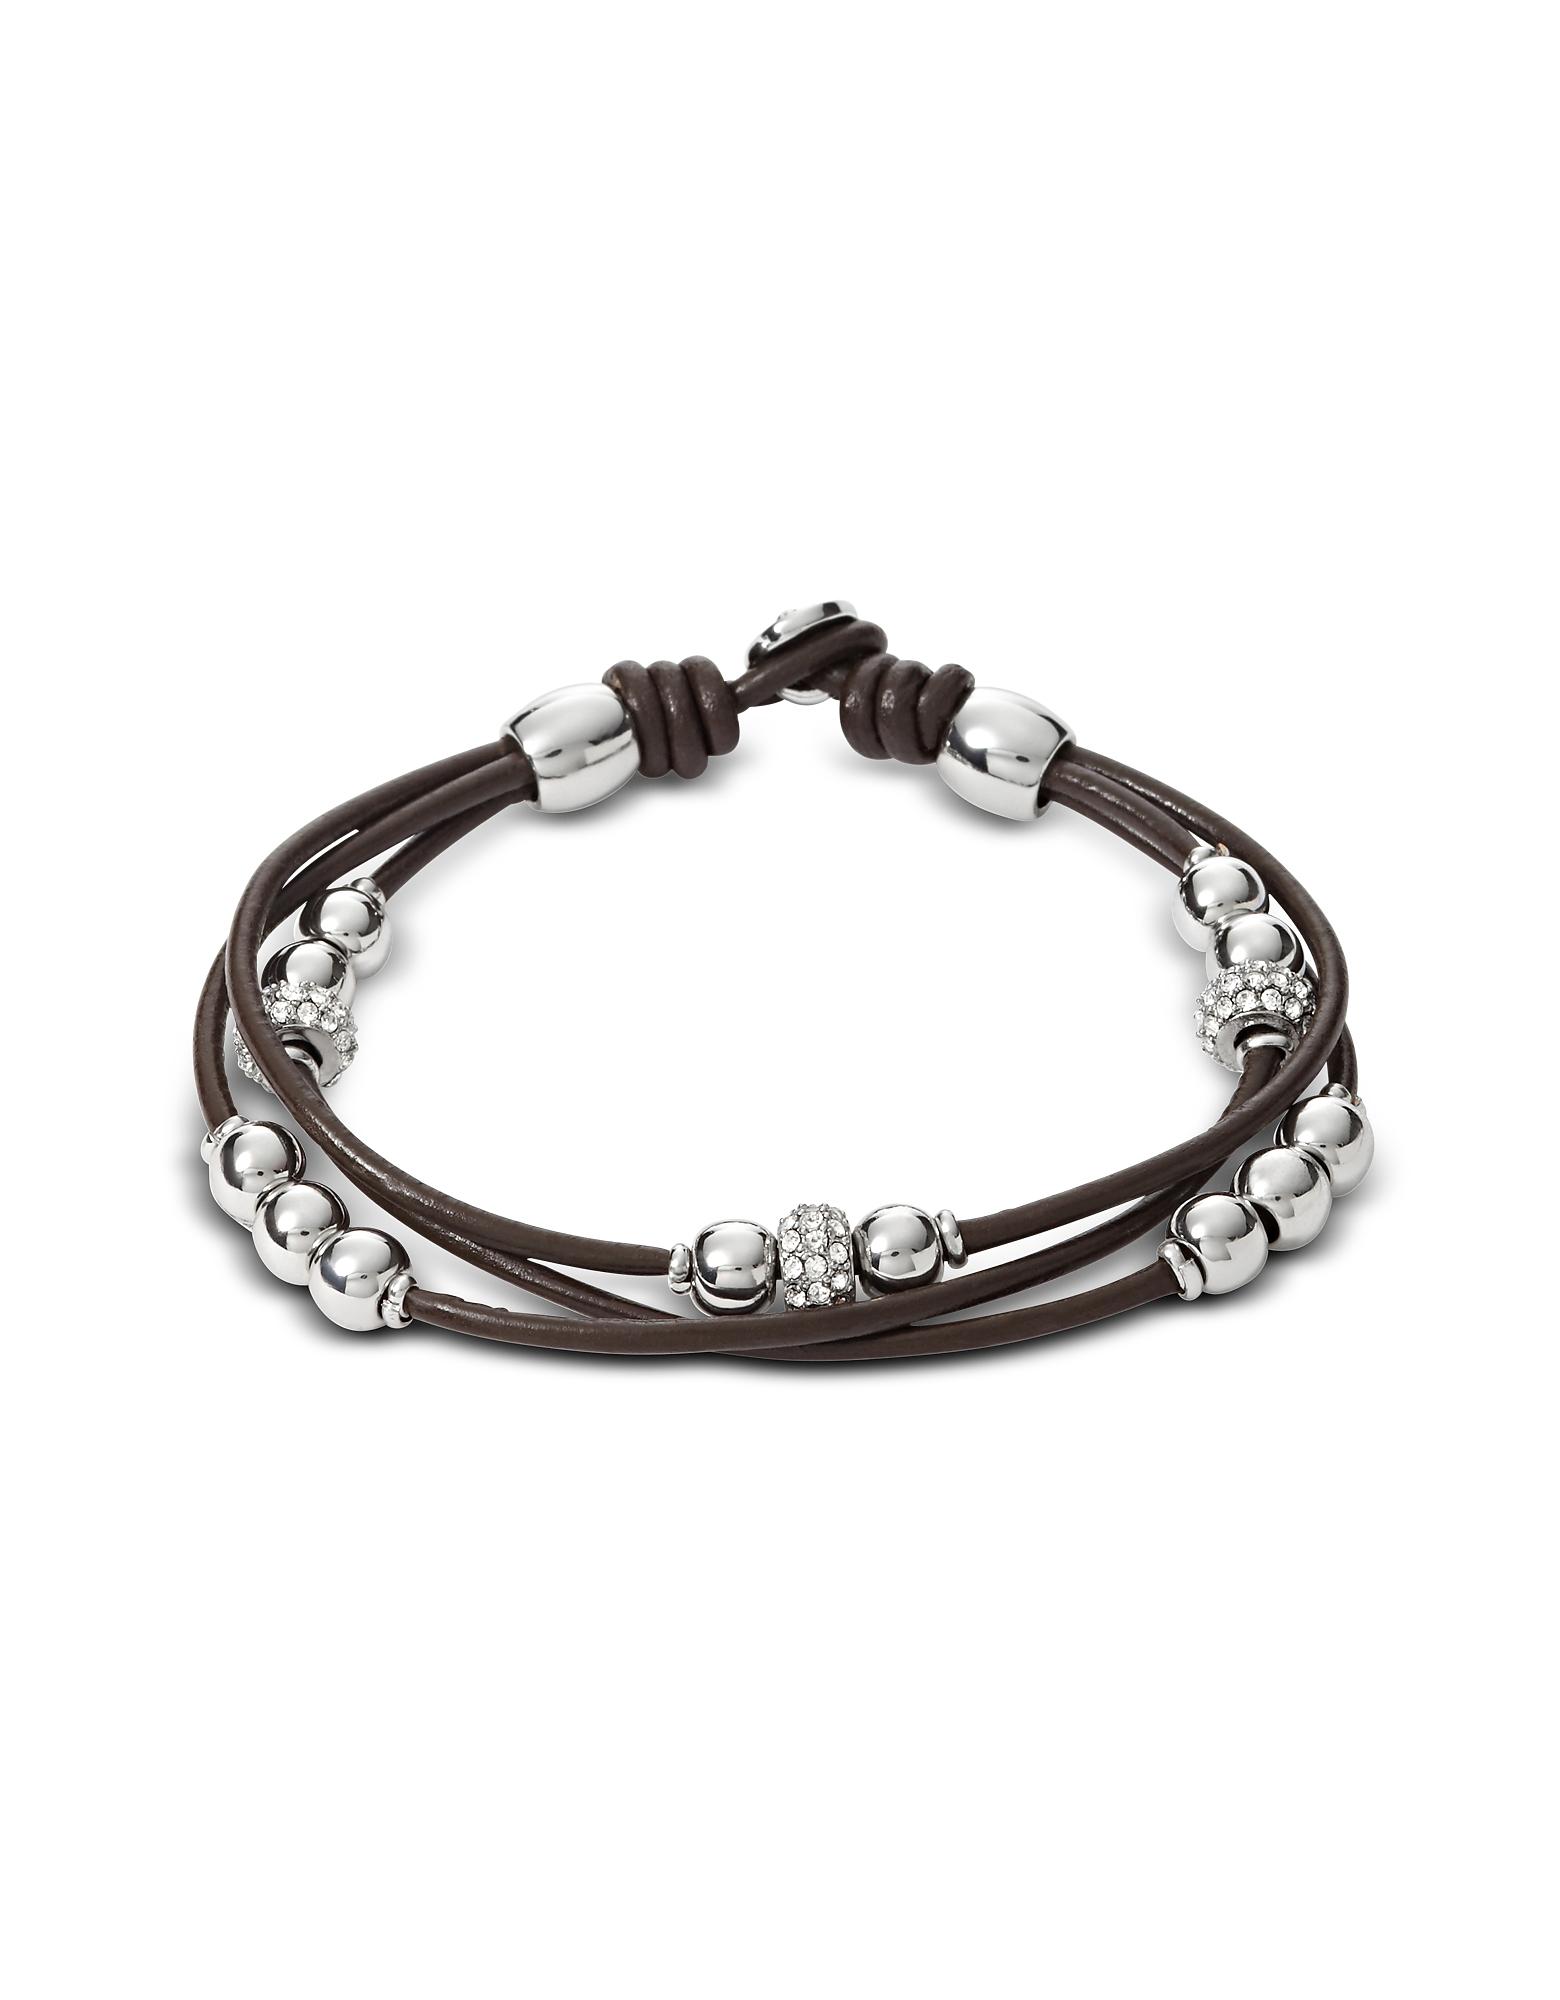 Fossil Bracelets, Chocolate Rondel Wrist Wrap Women's Bracelet